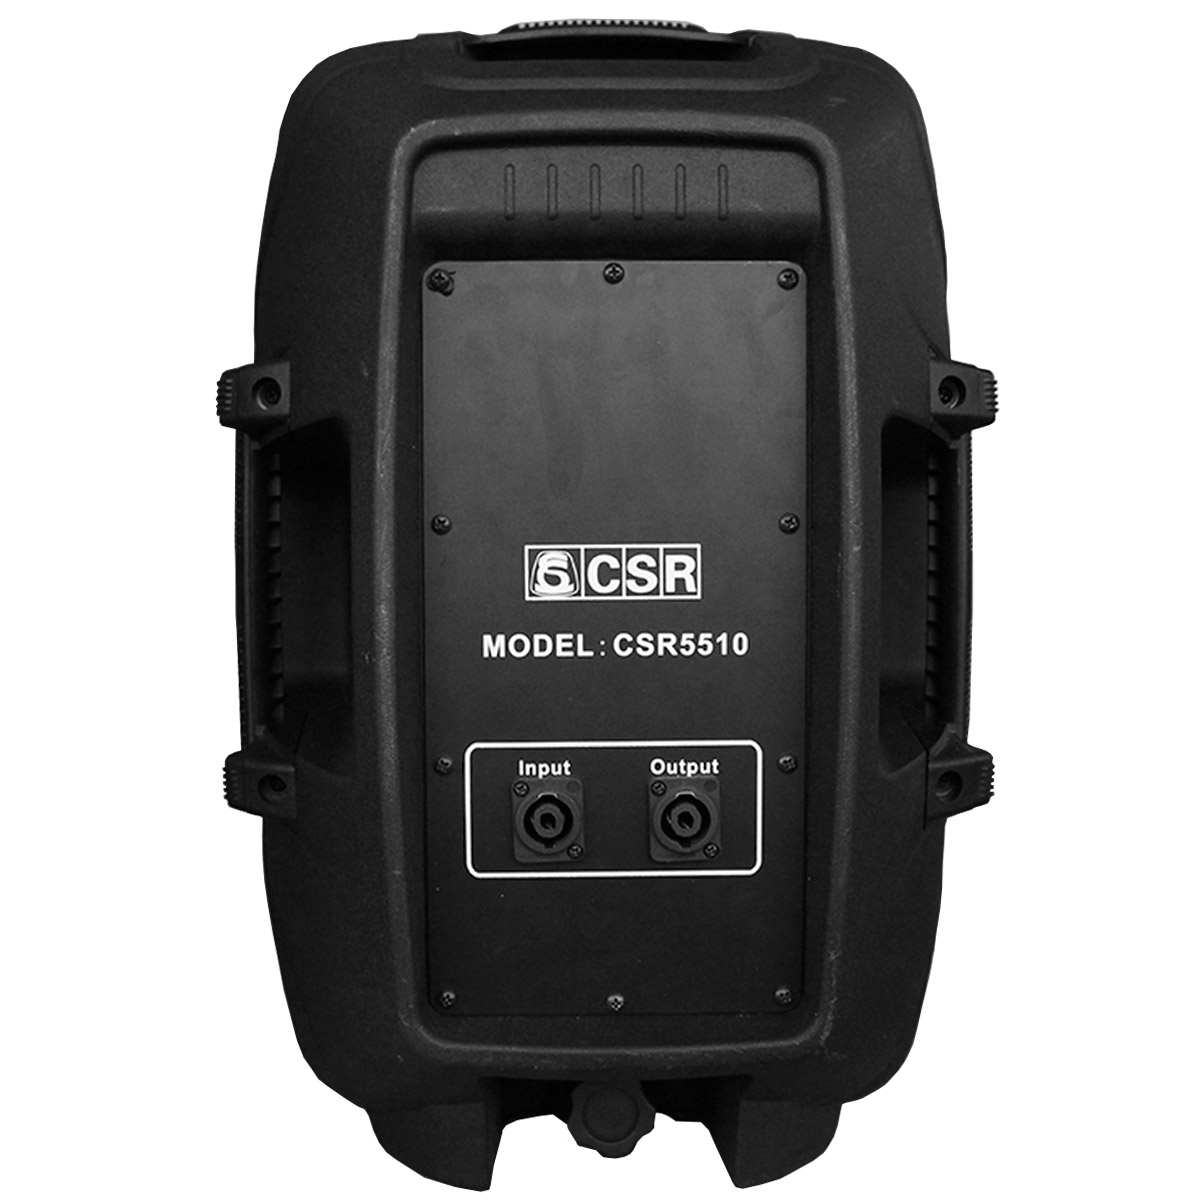 Caixa Passiva Fal 10 Pol 100W - CSR 5510